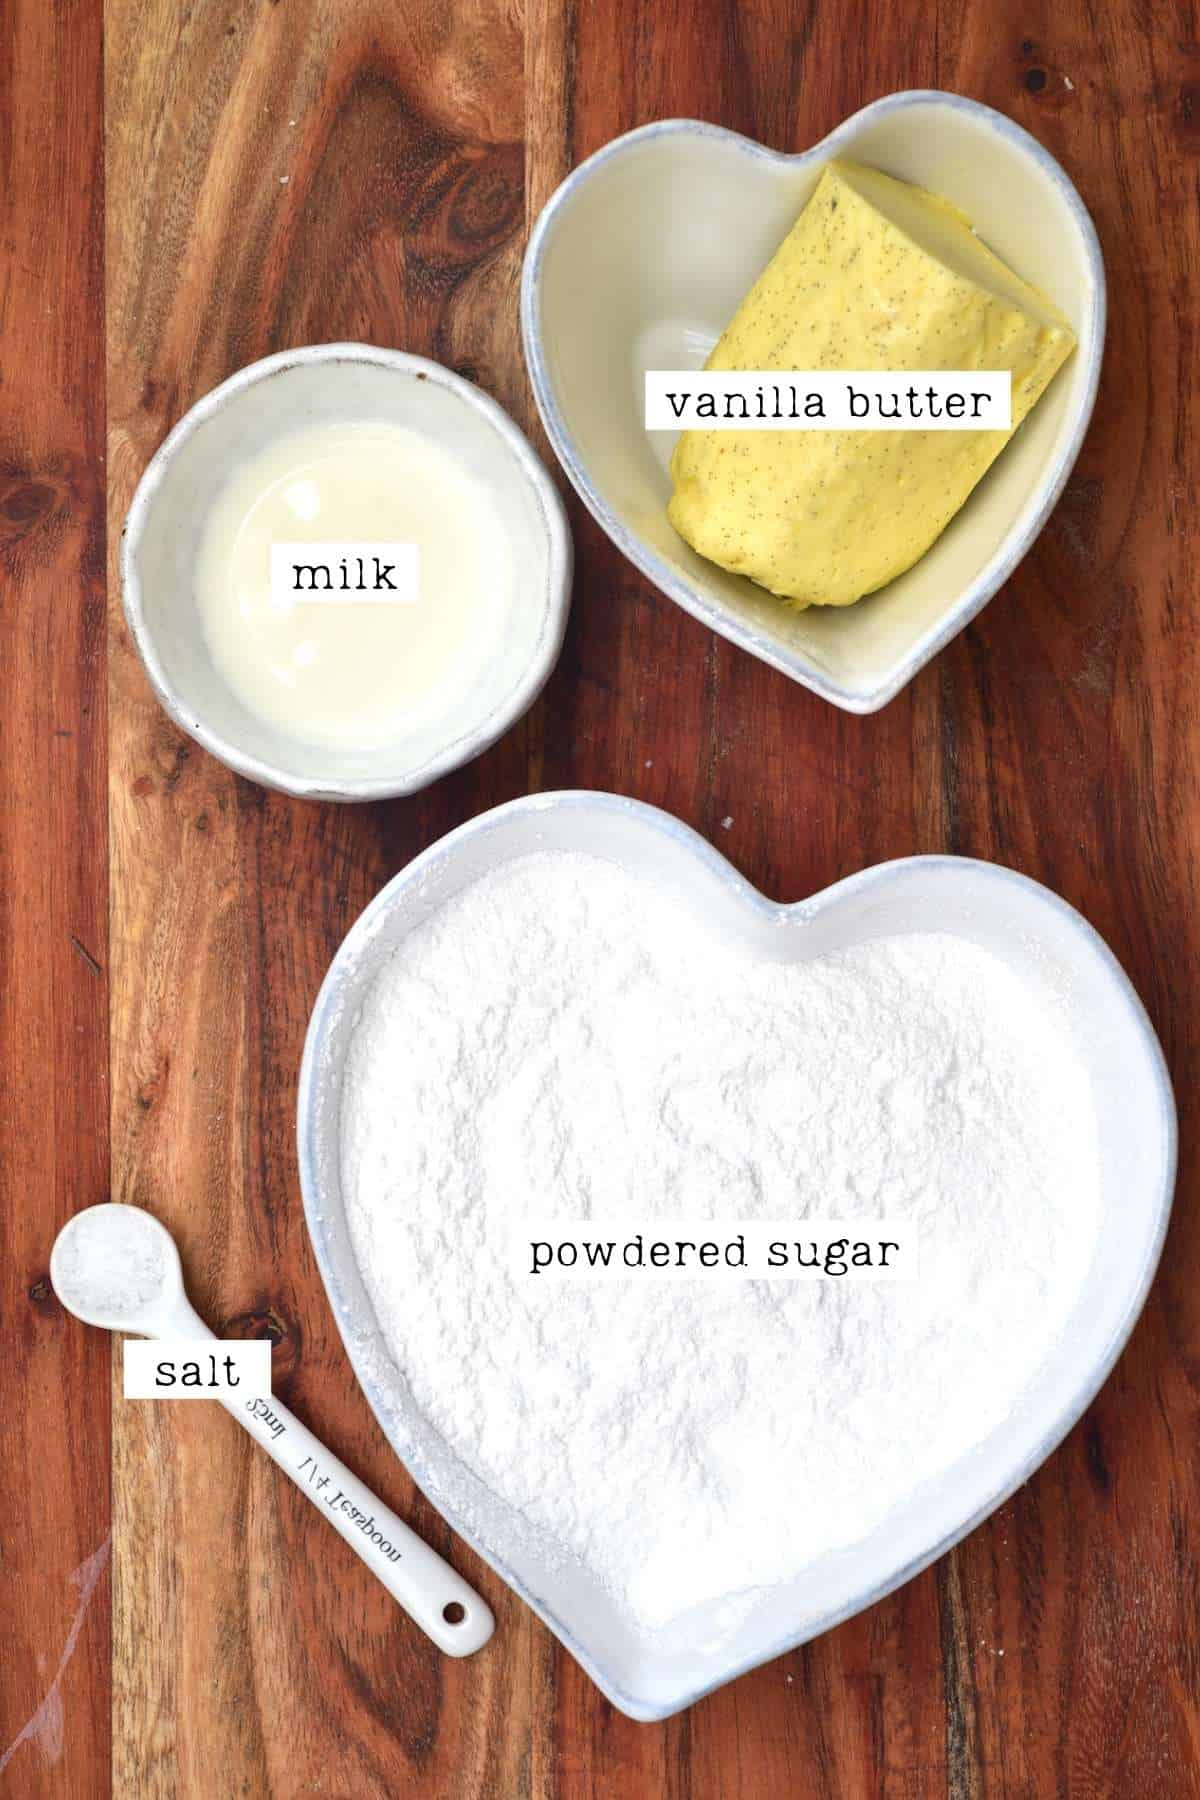 Ingredients for vanilla buttercream